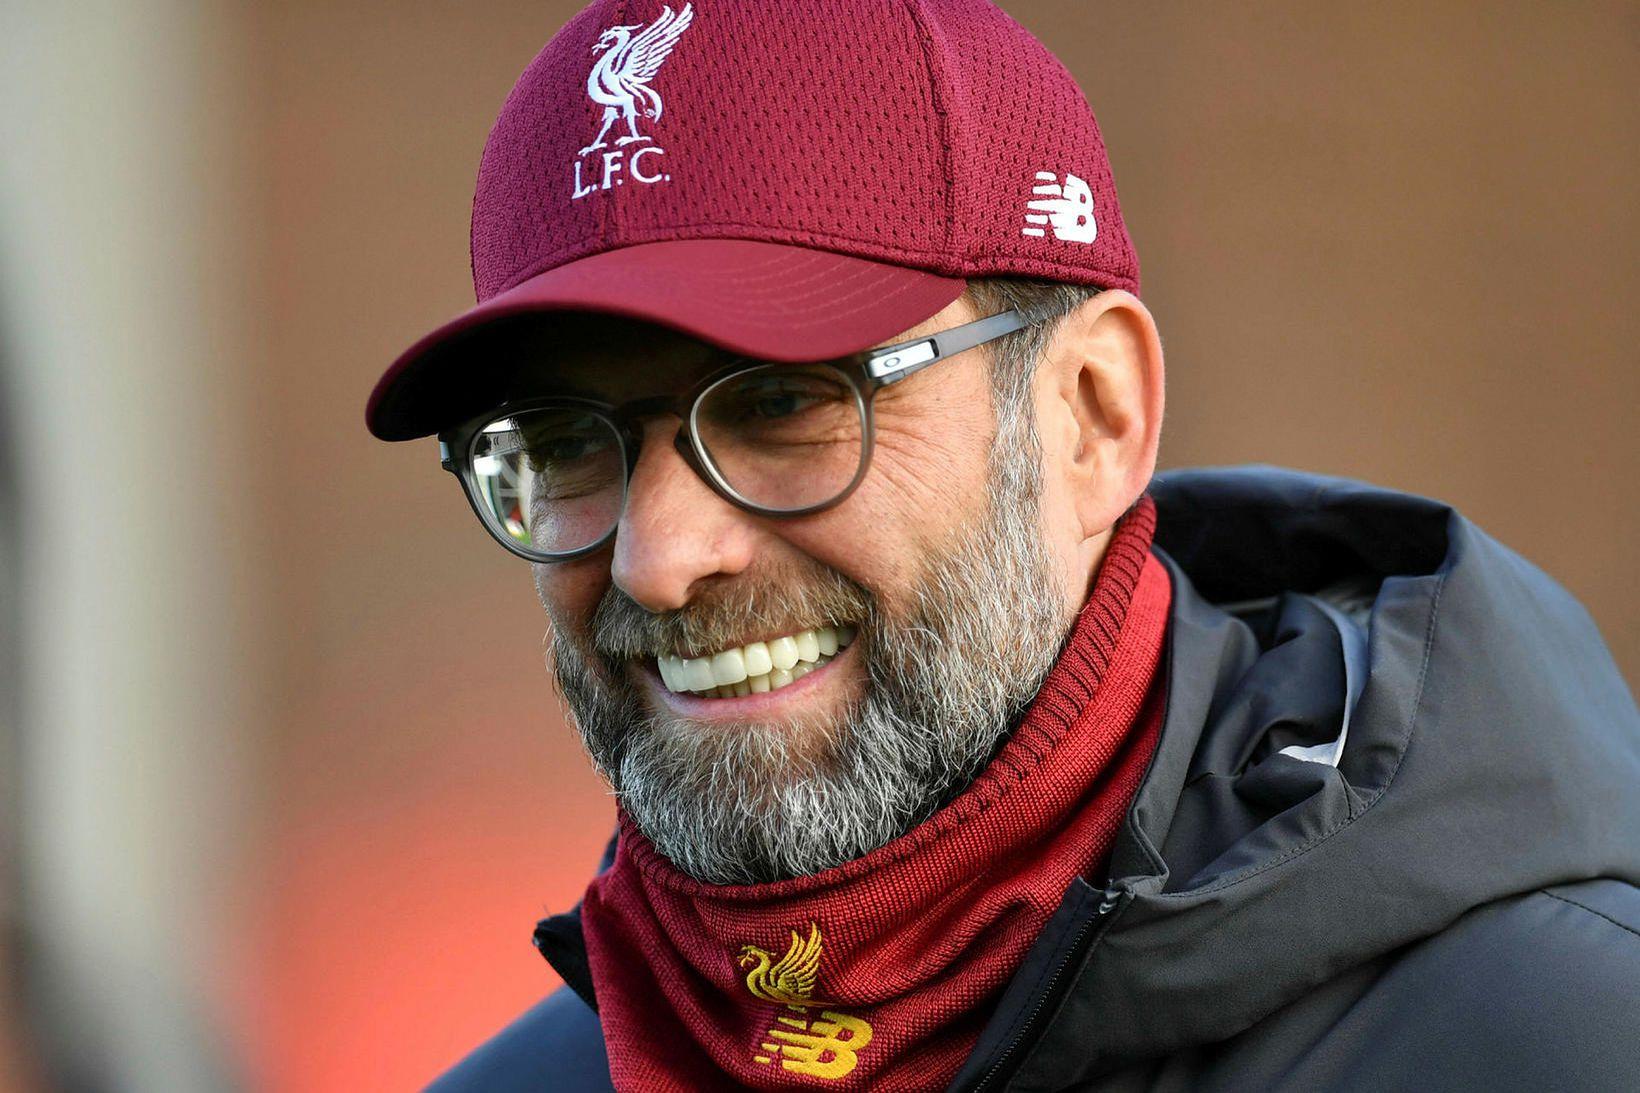 Jürgen Klopp nýtur mikilla vinsælda í Liverpool.